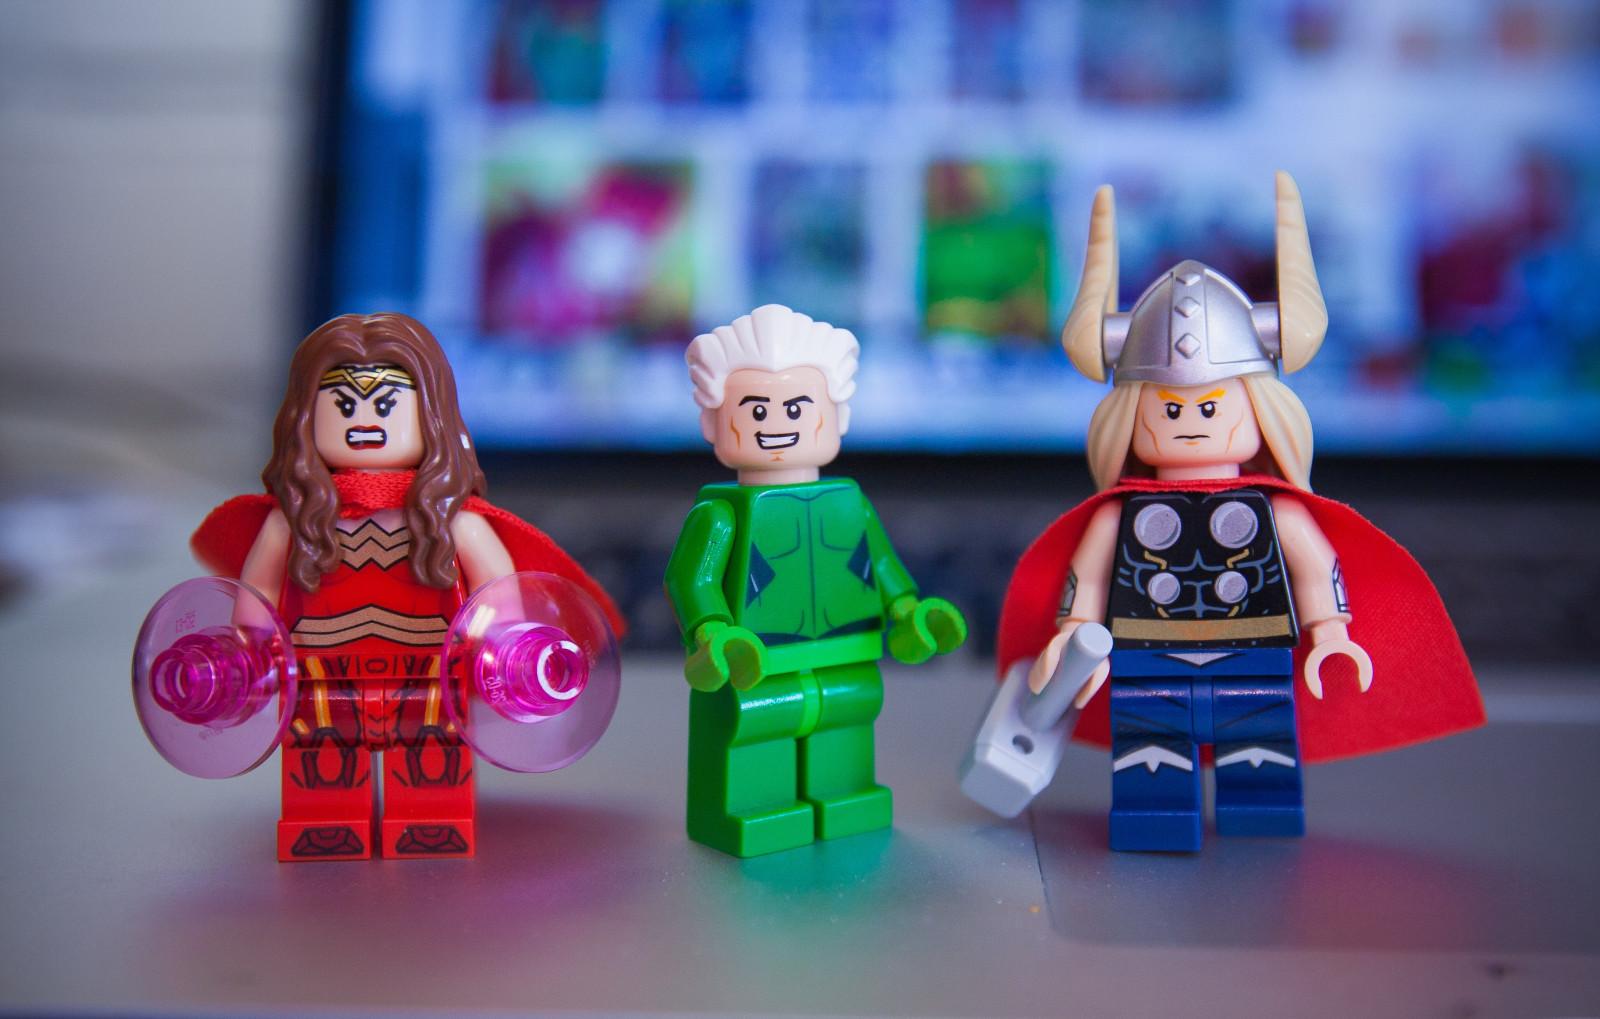 Wallpaper : classic, scarlet, comics, Jack, Kirby, LEGO ...